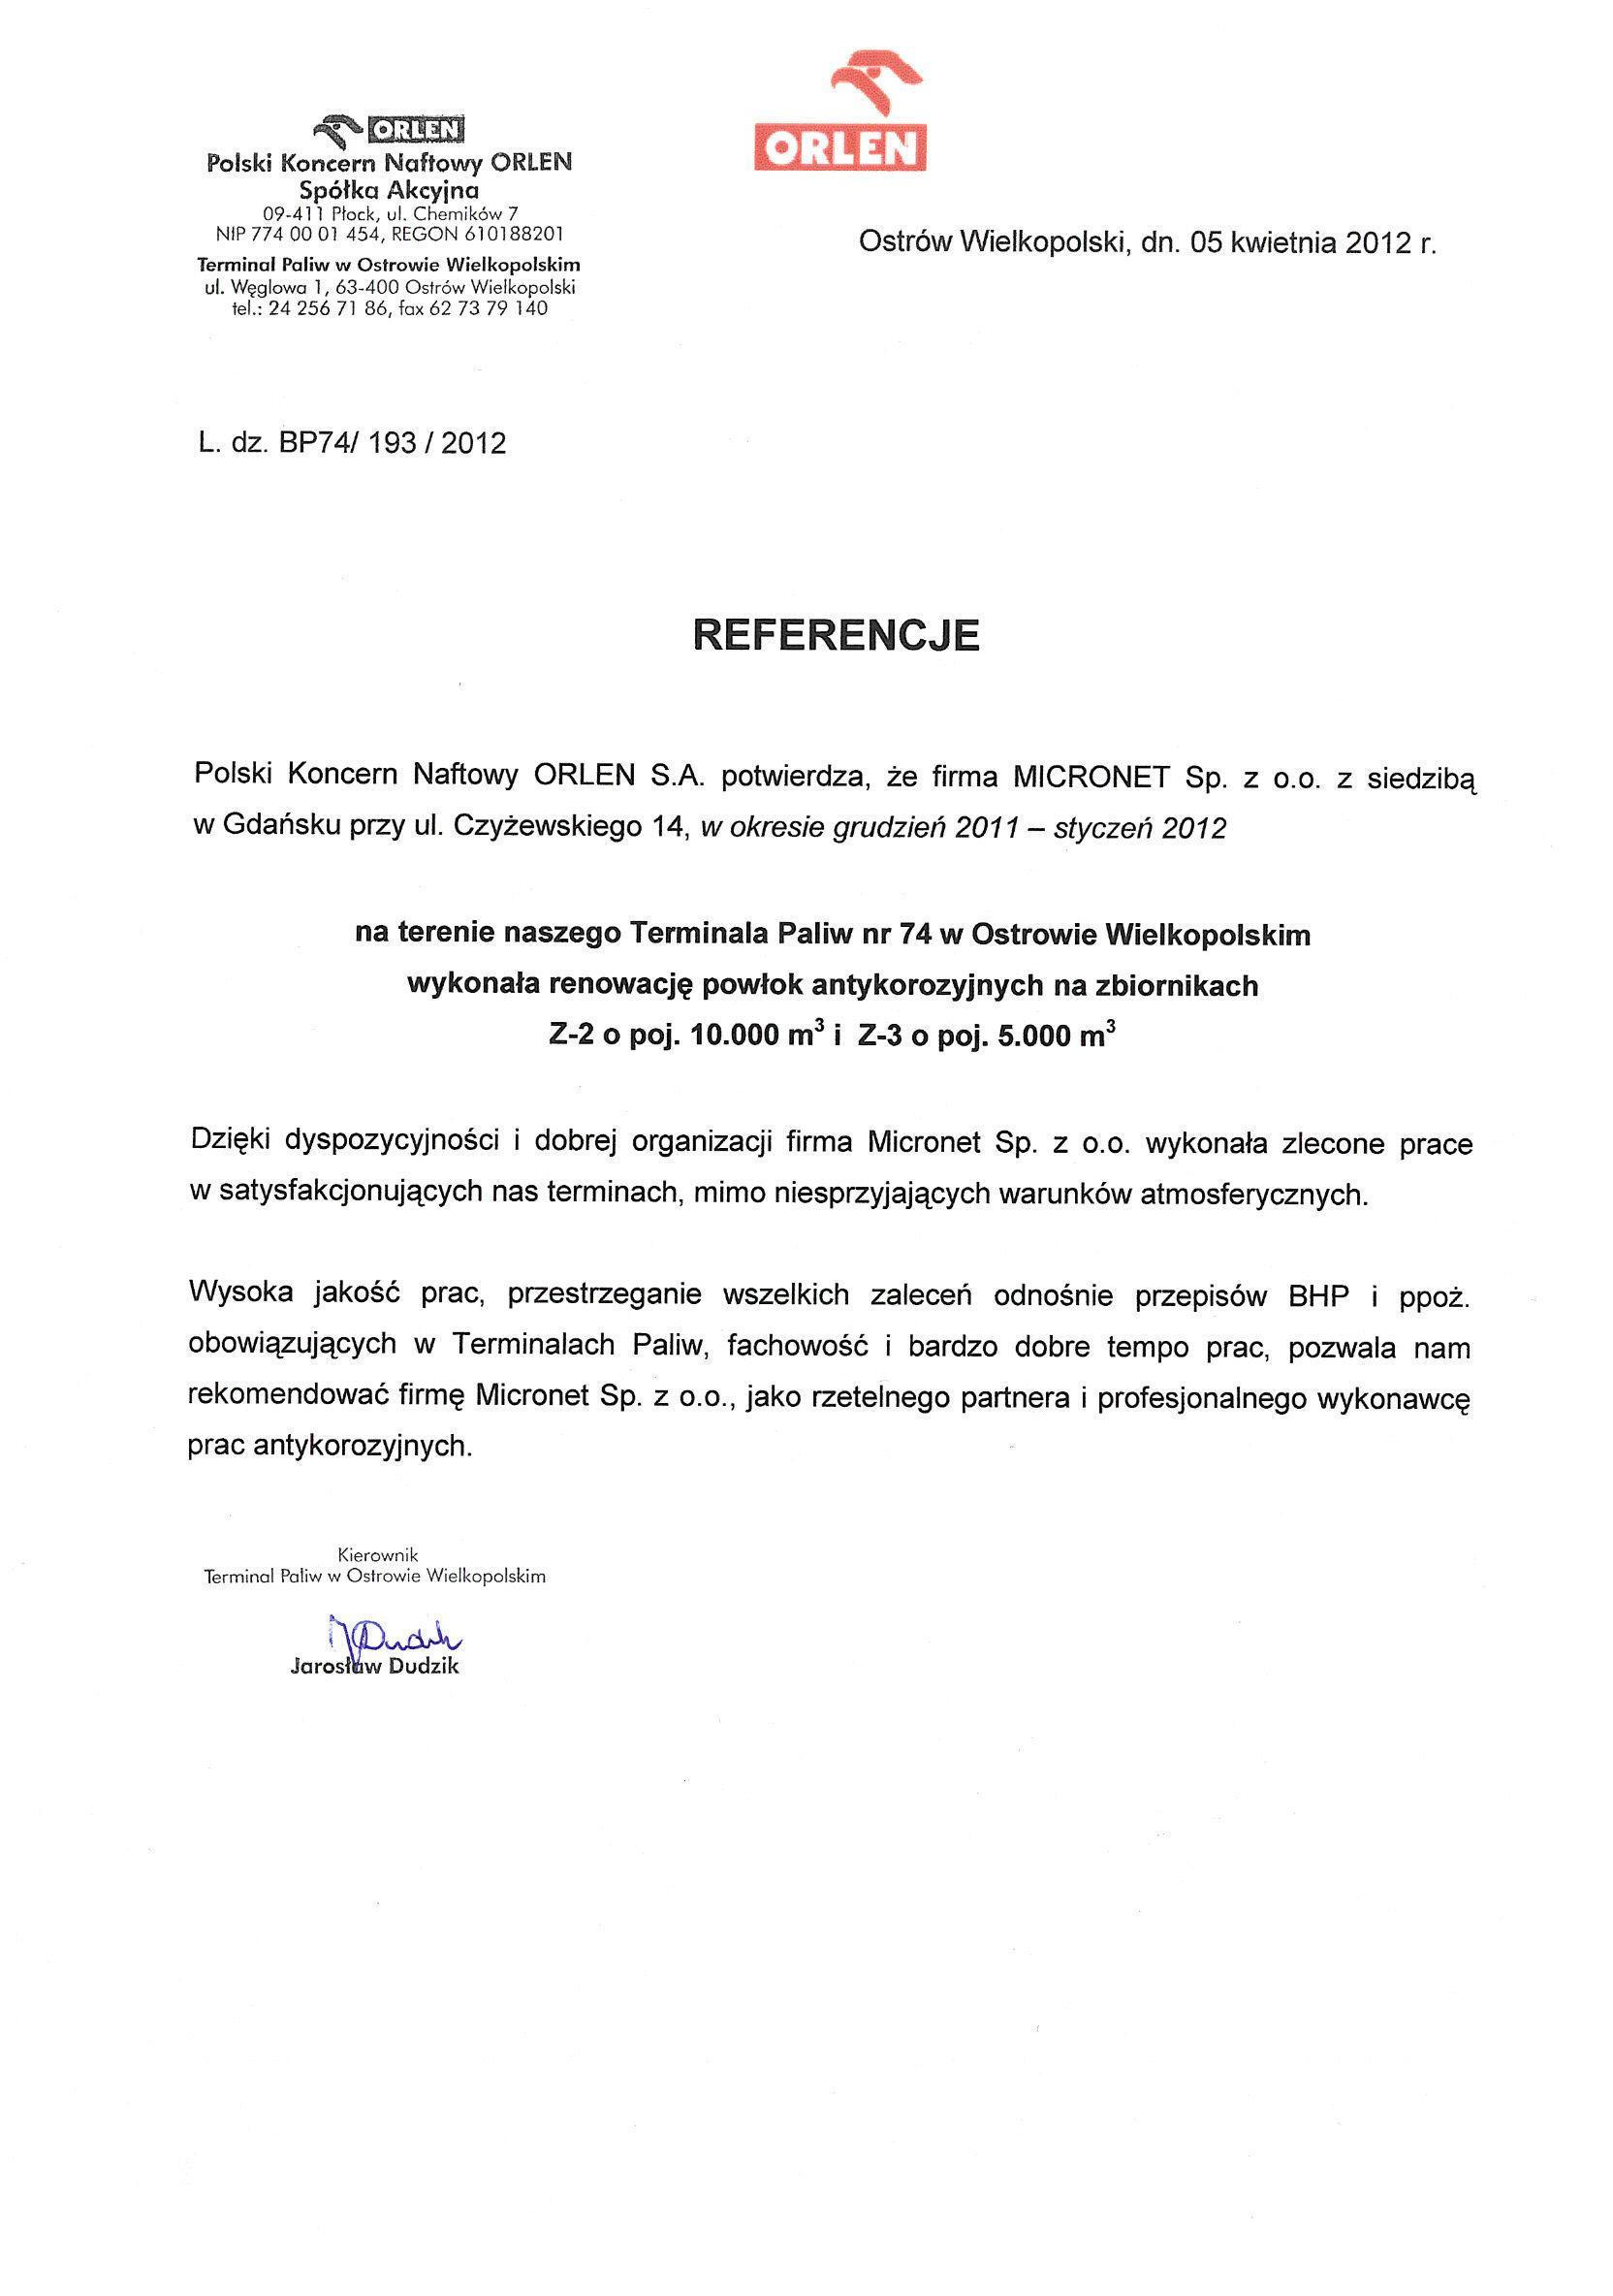 ORLEN Ostrów Wielkopolski